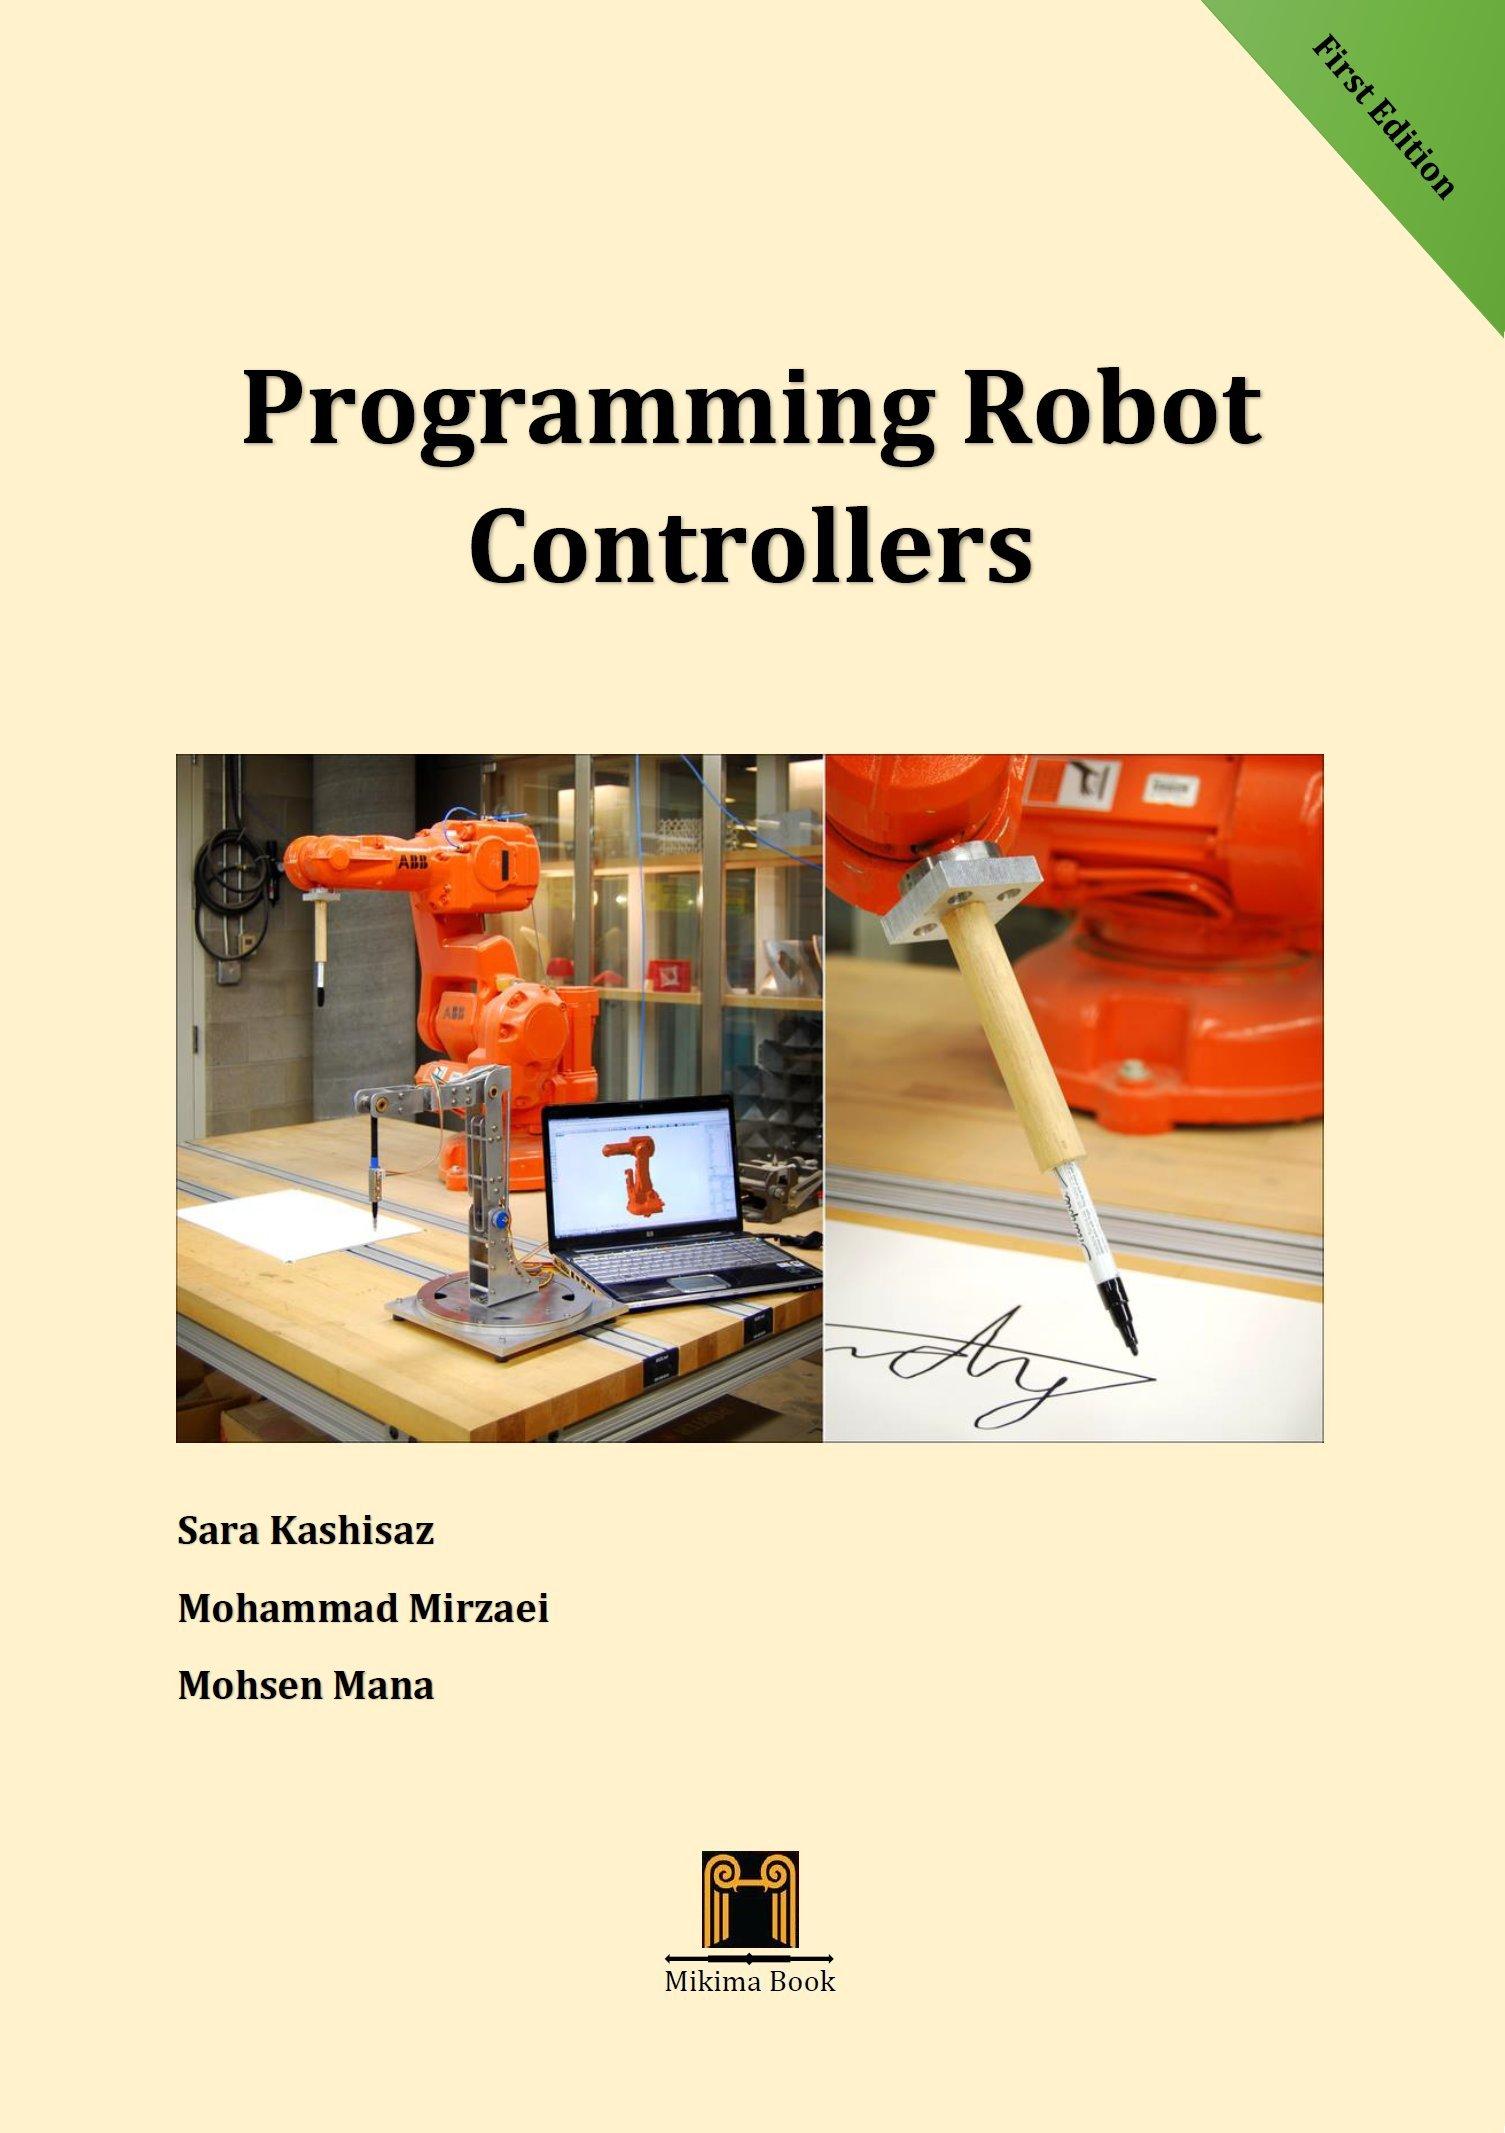 Programming Robot Controllers: 9780994497383: Amazon com: Books